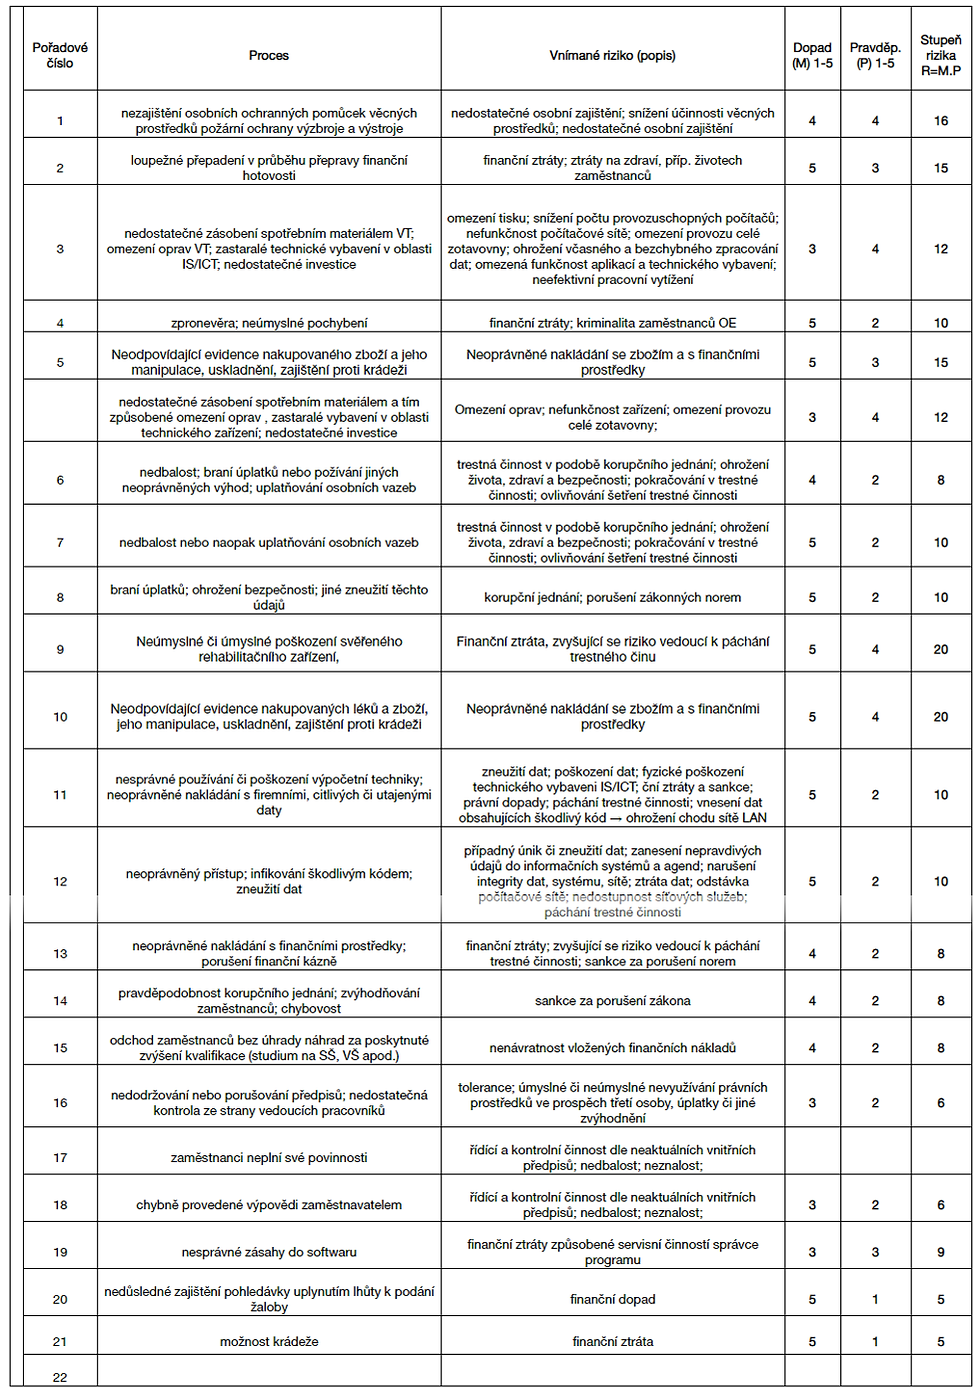 tabulka-korupce.png